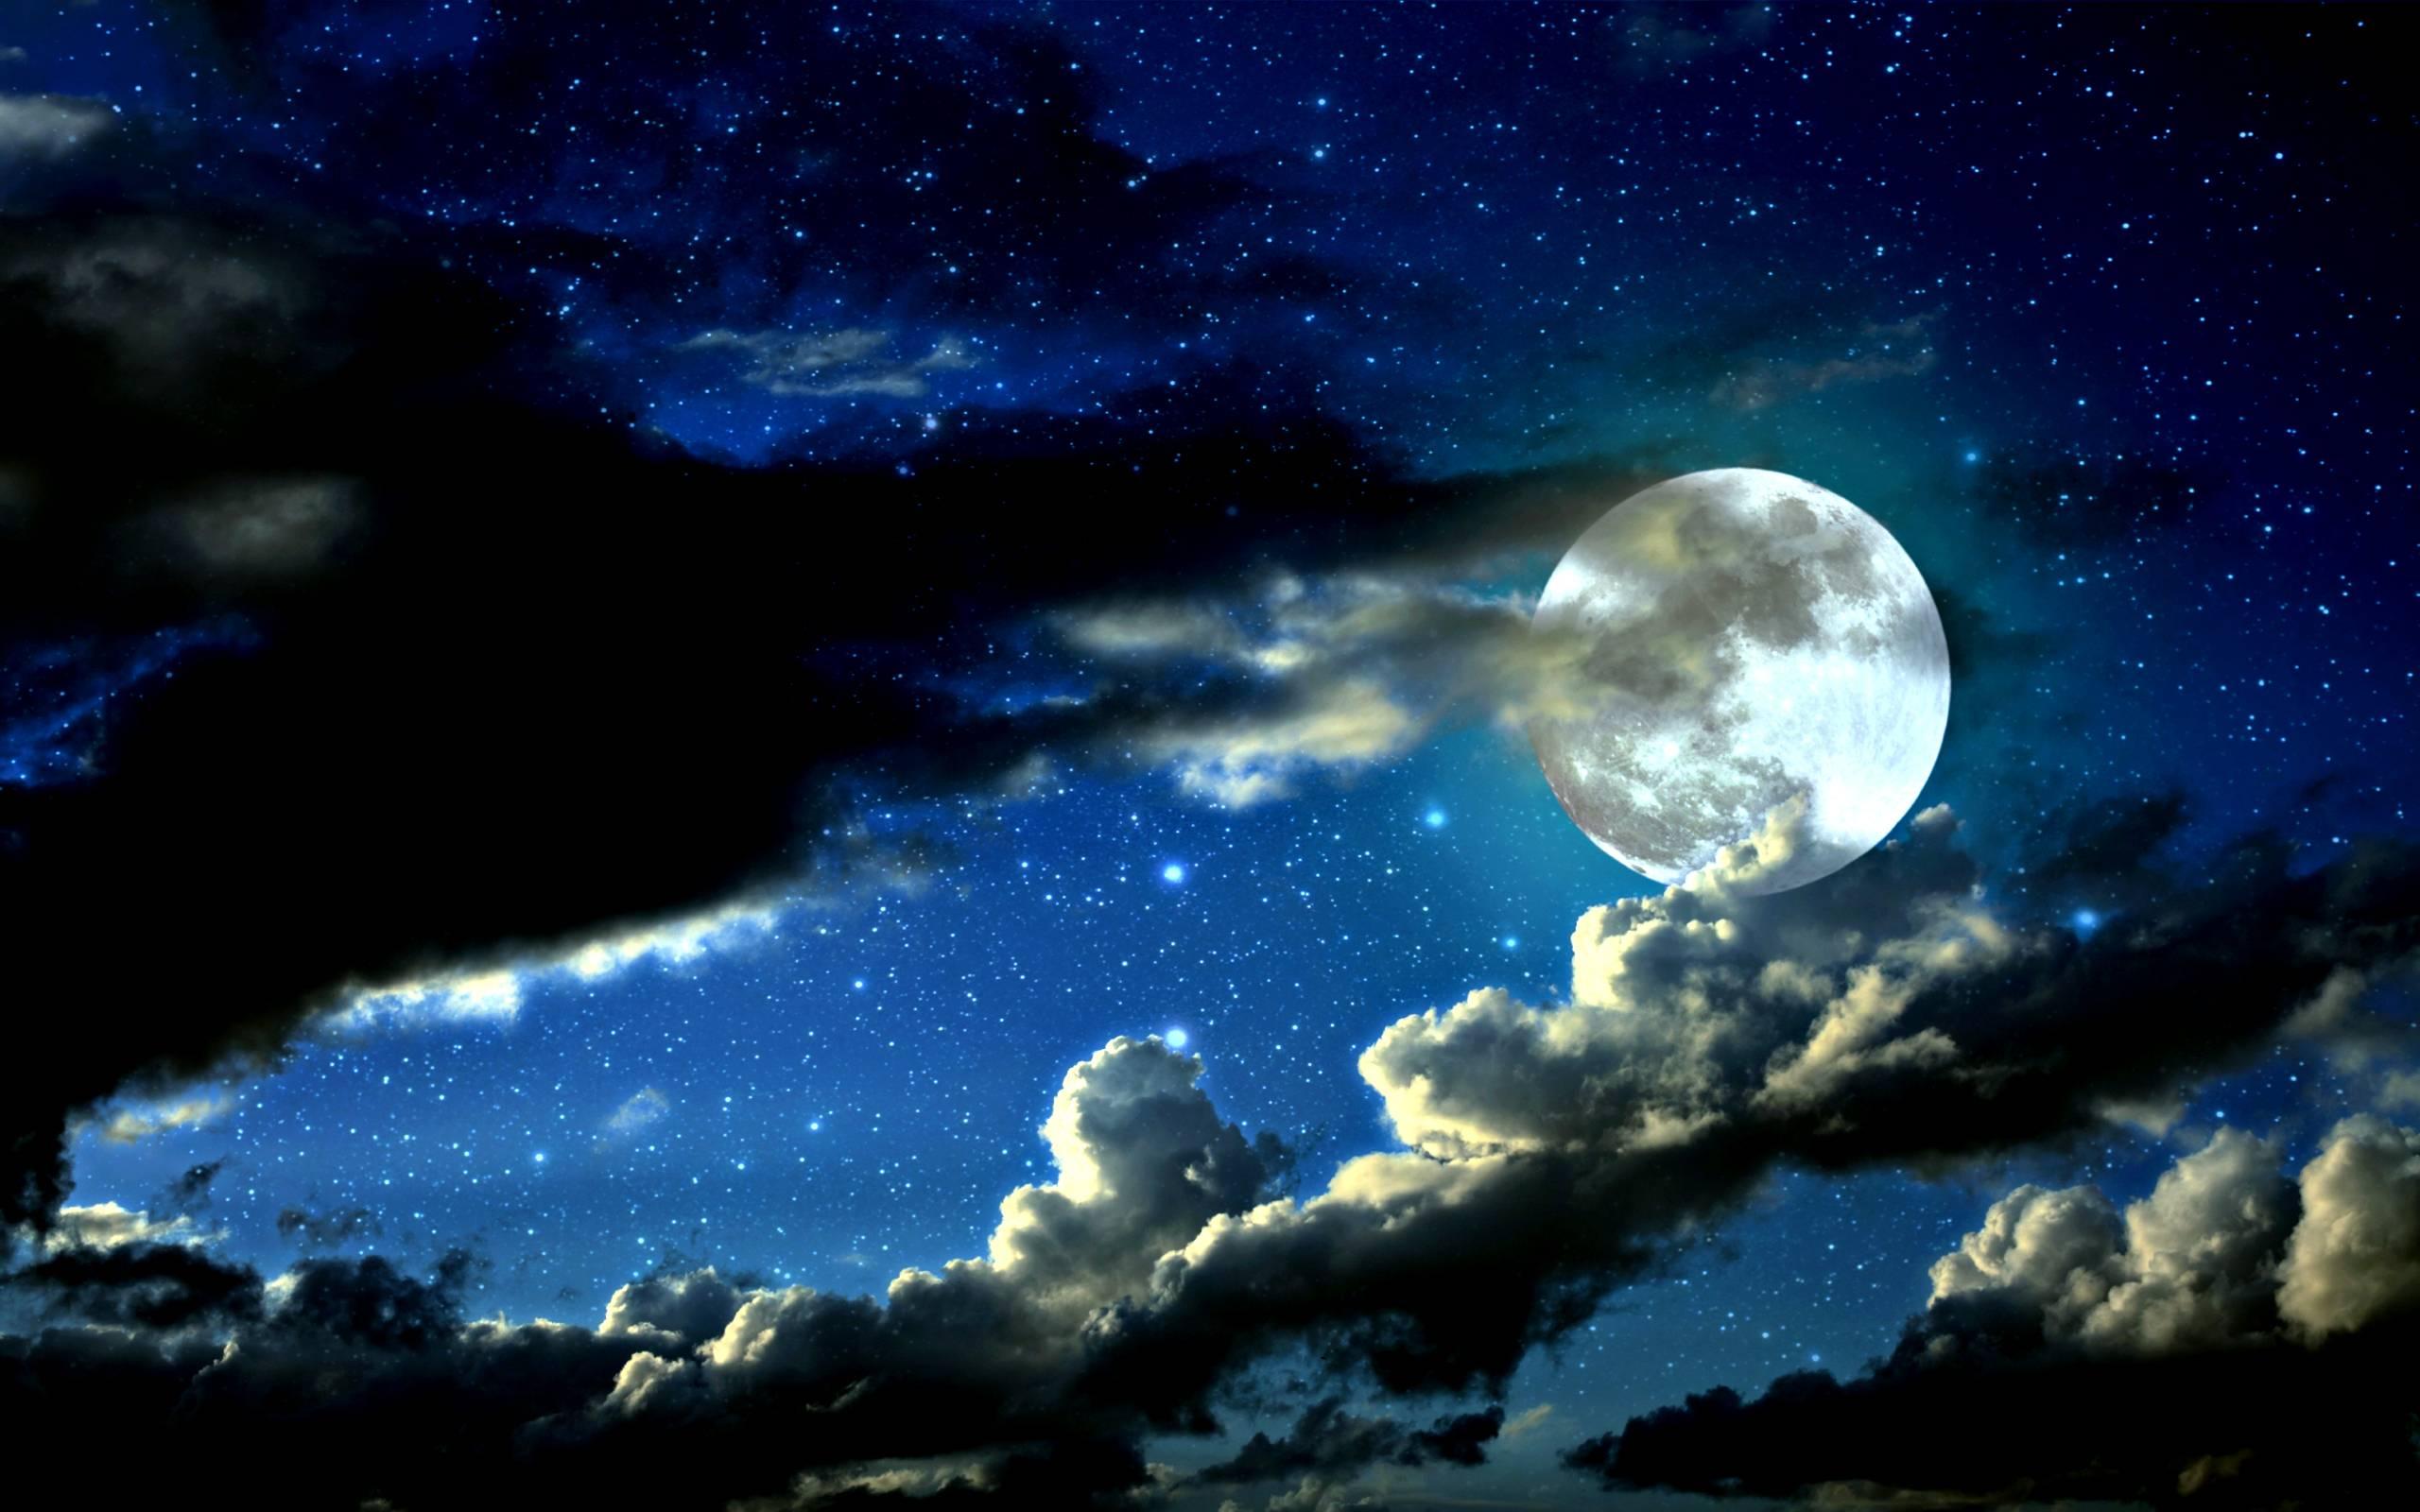 Full Moon Wallpaper, wallpaper, Full Moon Wallpaper hd wallpaper ...